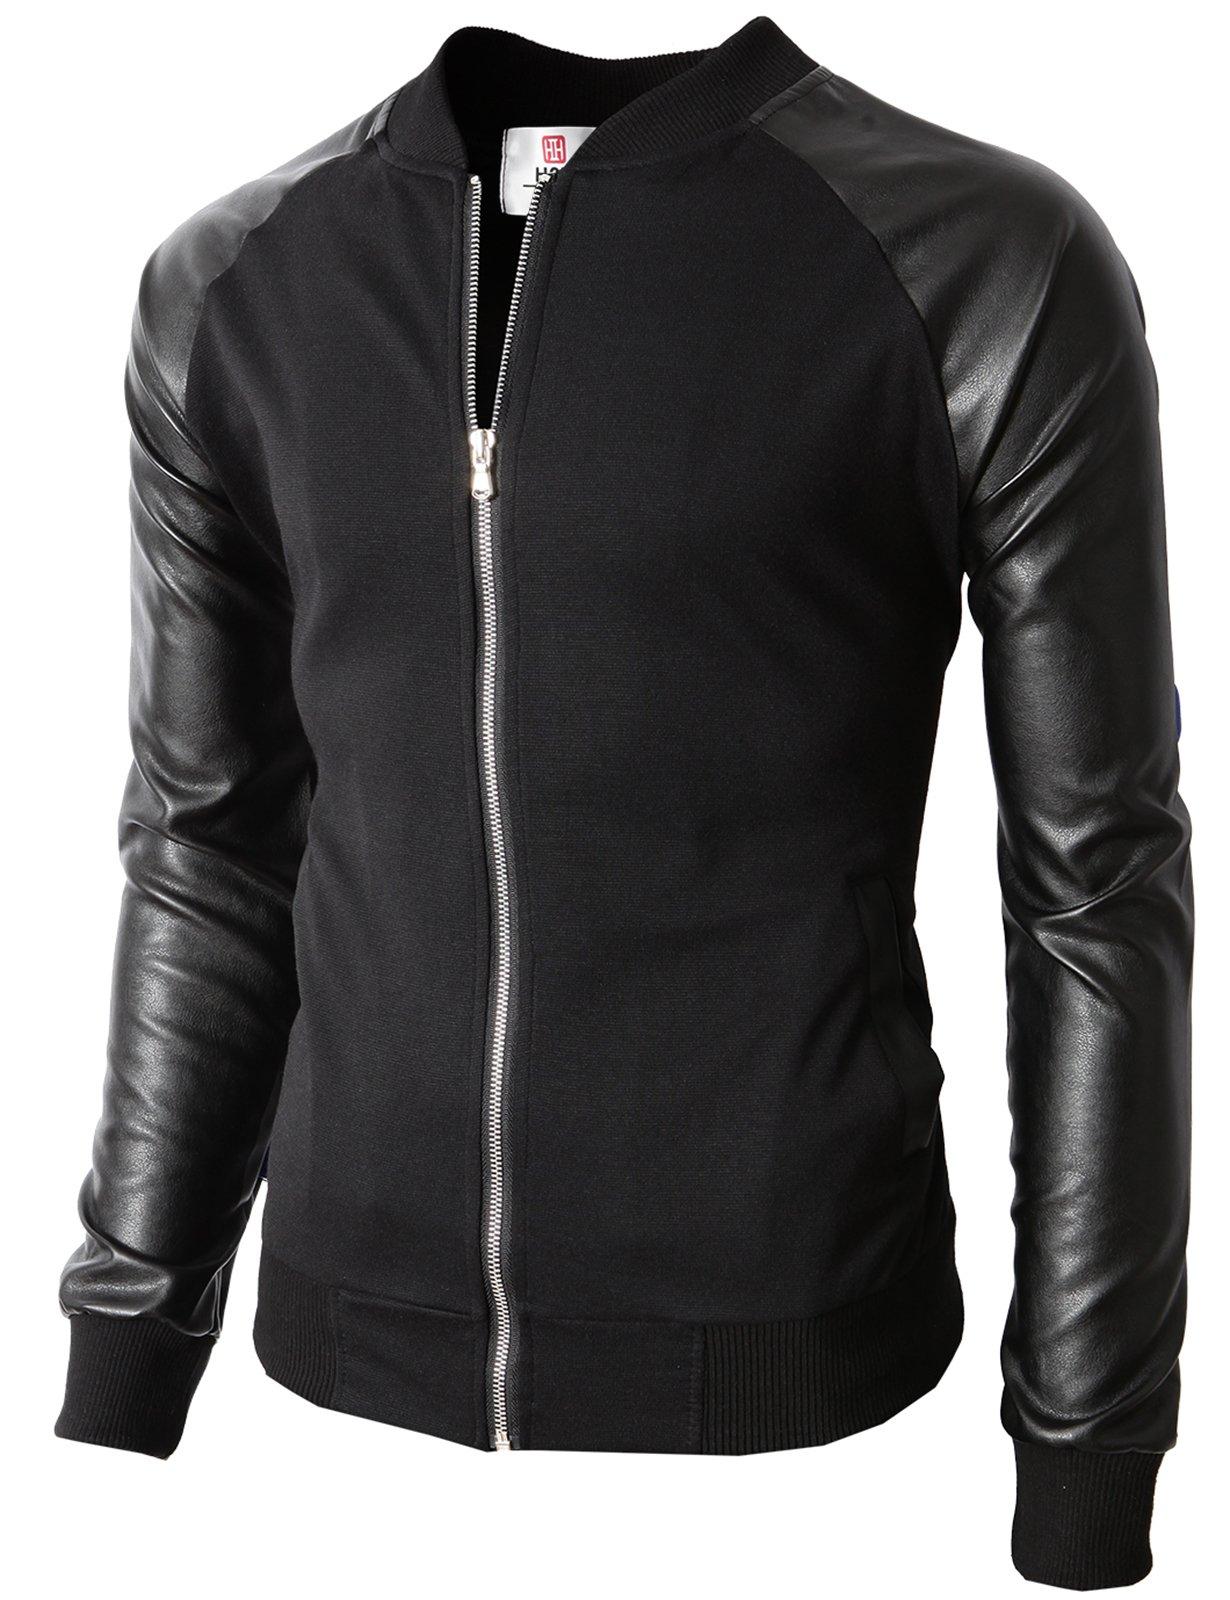 H2H Men's Cotton Lightweight Slim Fit Jacket Casual Wear BLACK US M/Asia L (KMOJA0126) by H2H